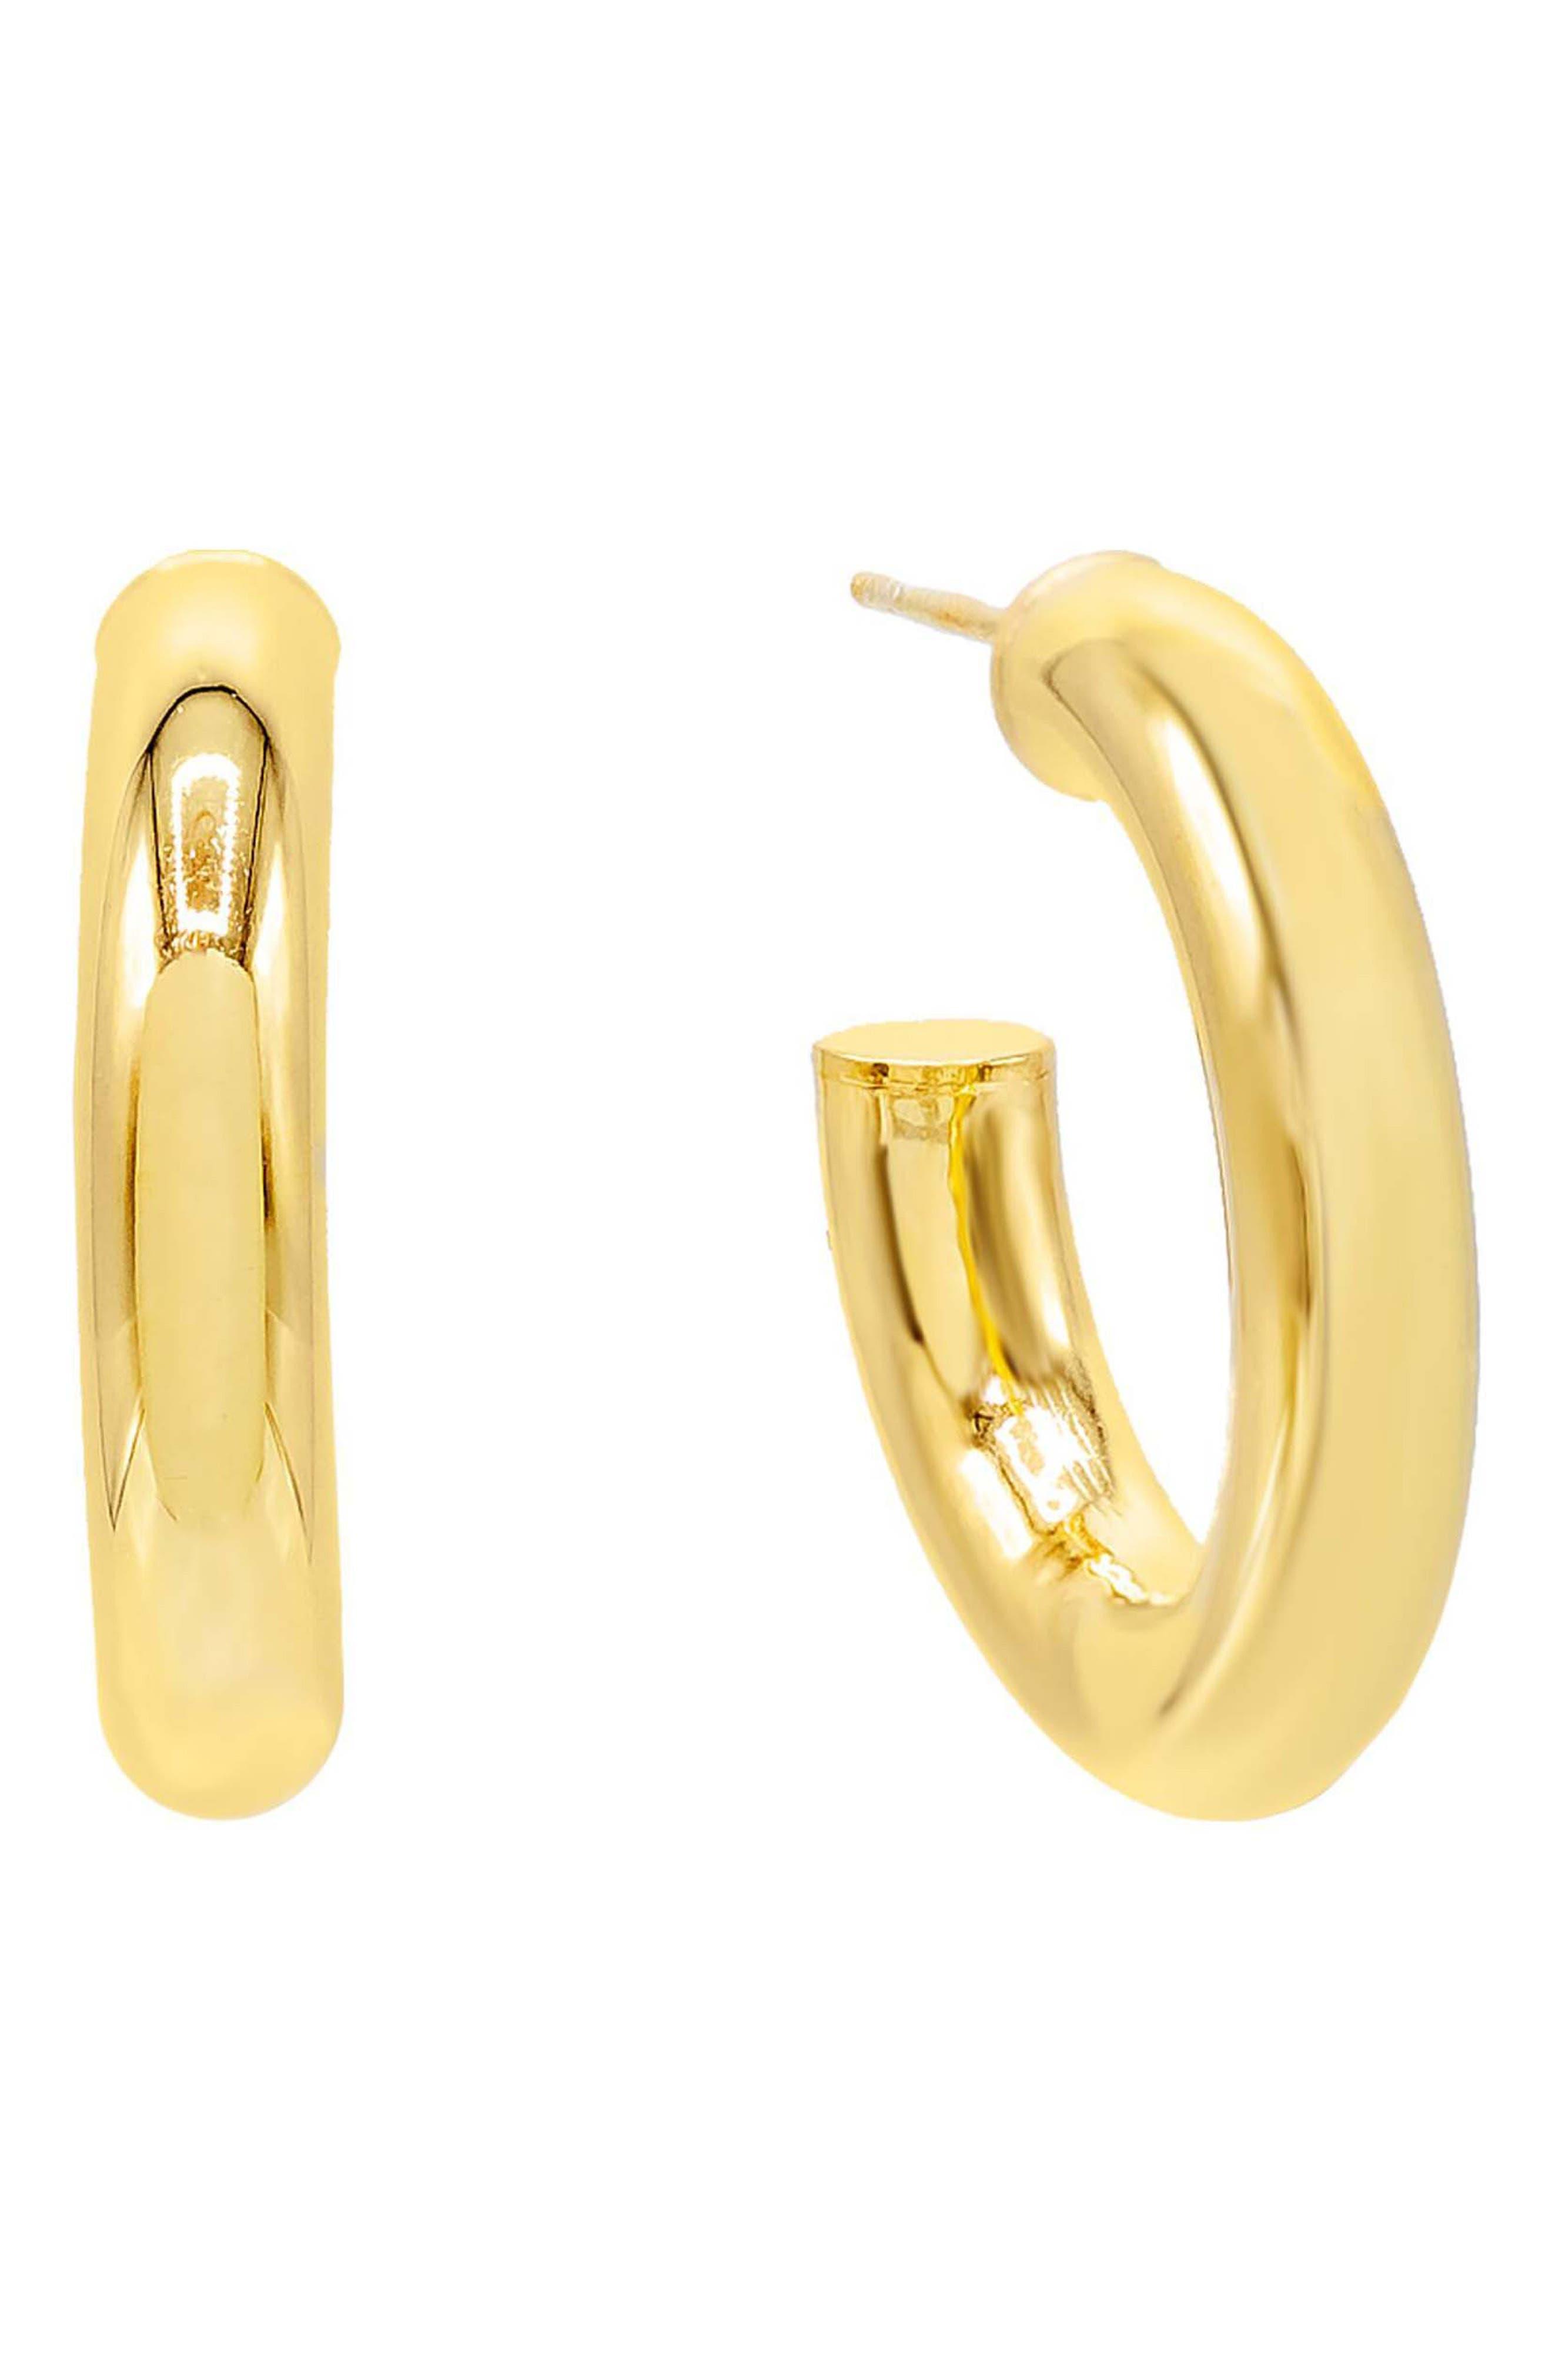 Women's Adina's Jewels Thick Hollow Hoop Earrings